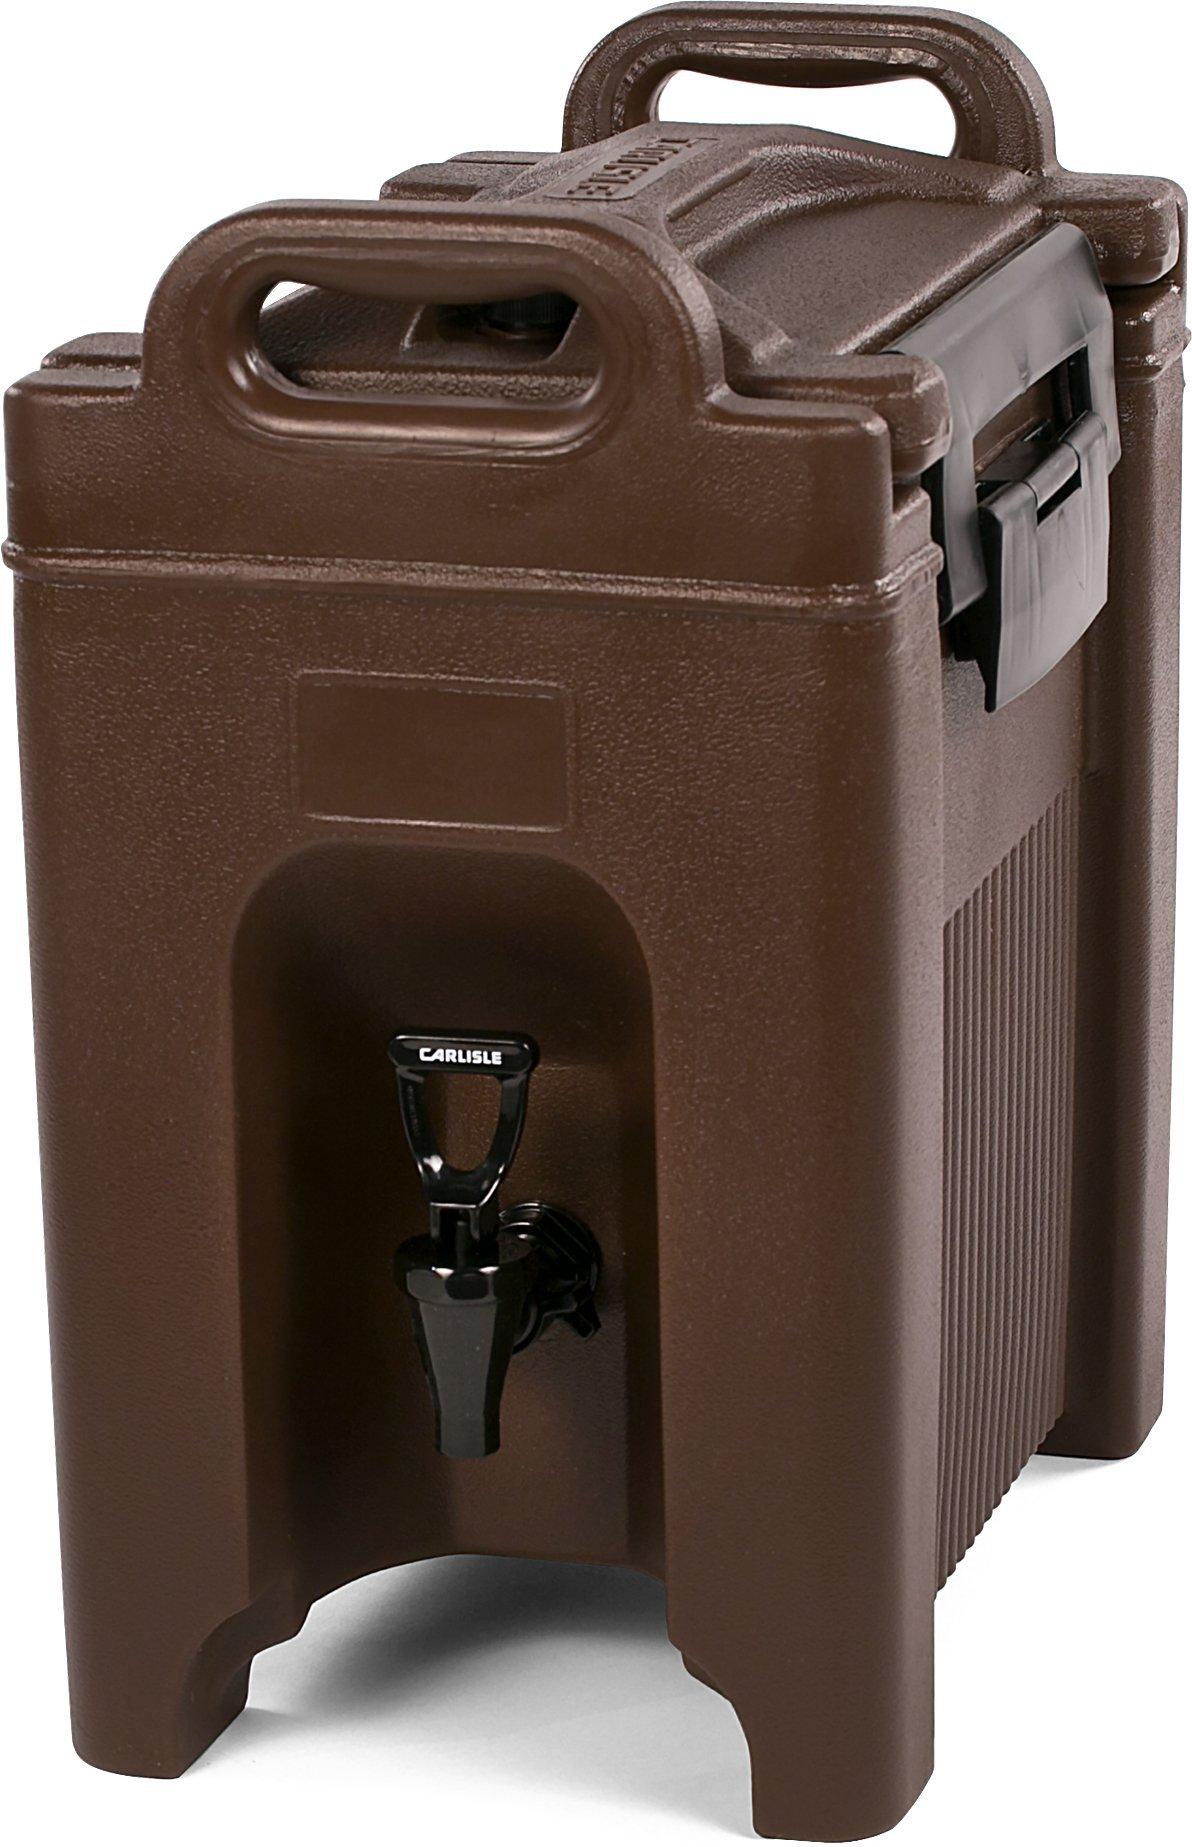 Carlisle XT250001 Cateraide Insulated Beverage Server Dispenser, 2.5 Gallon, Brown